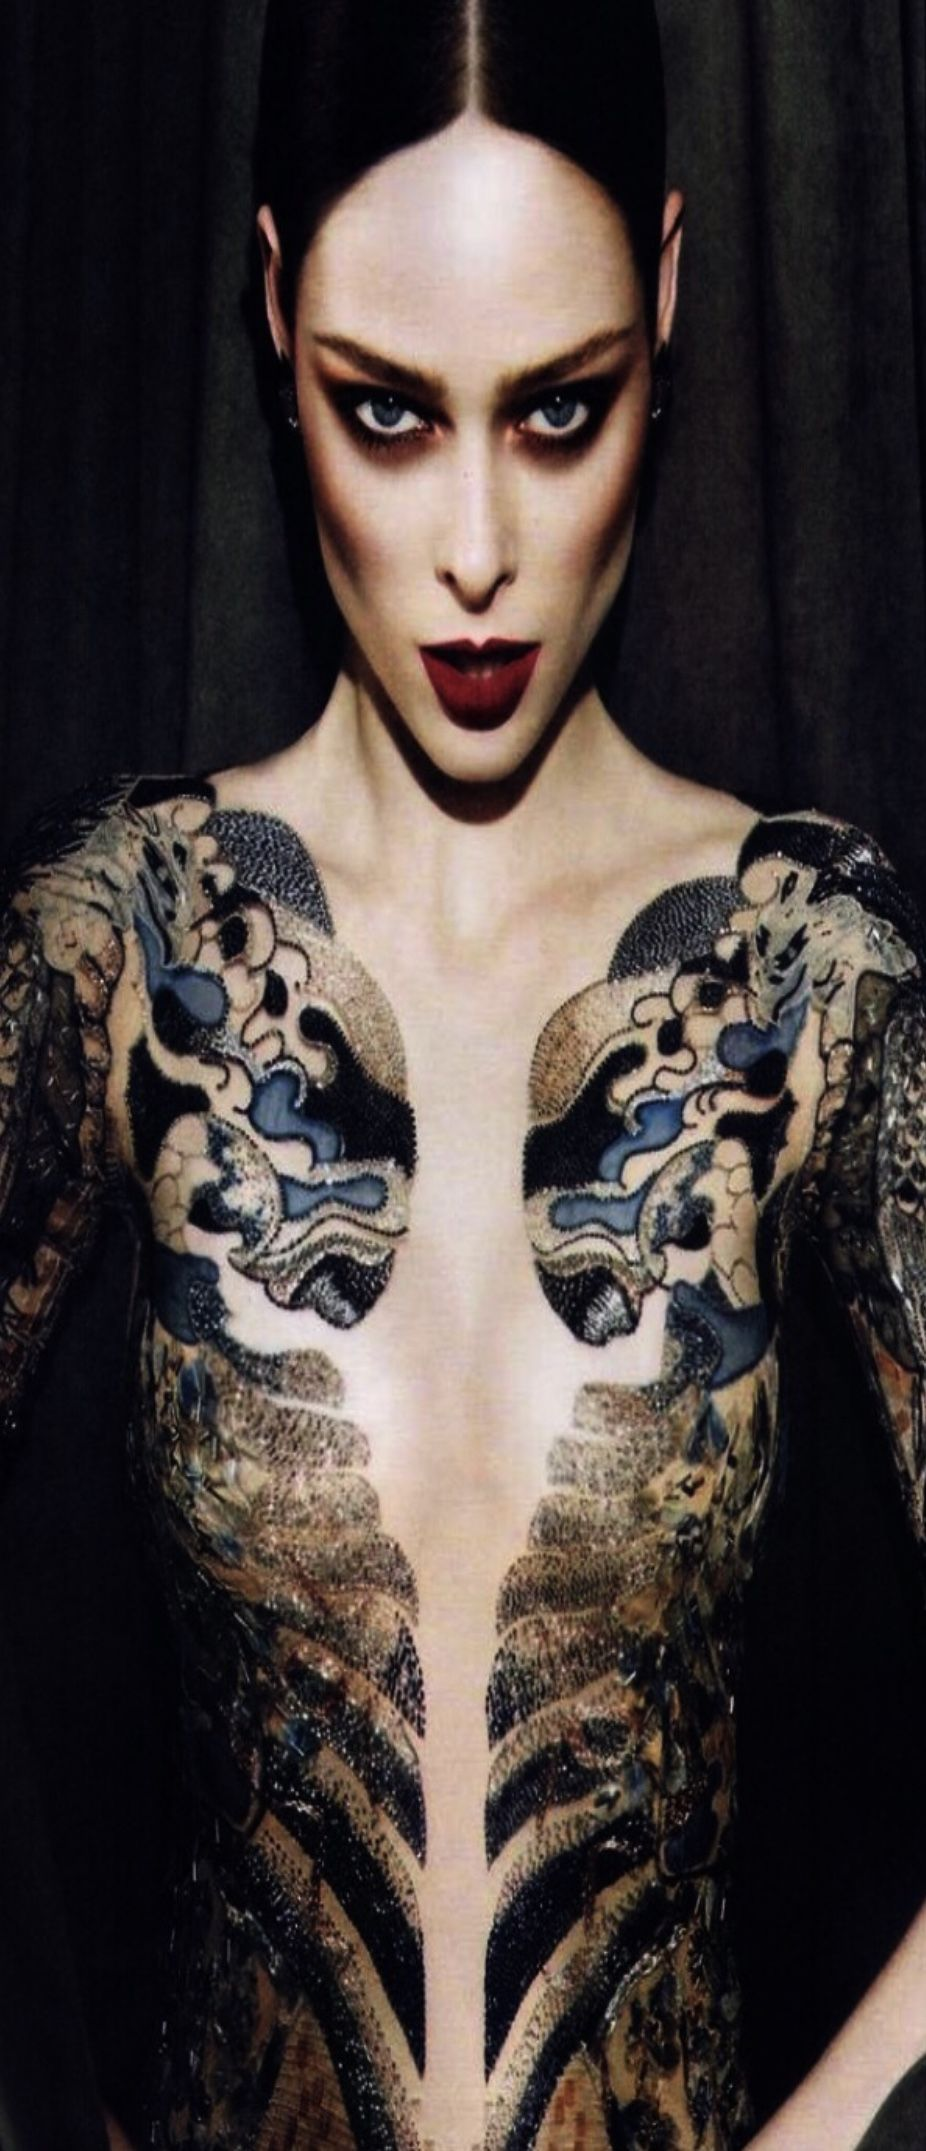 Pin by War*rior on Rorschach Model, Girl tattoos, Yakuza